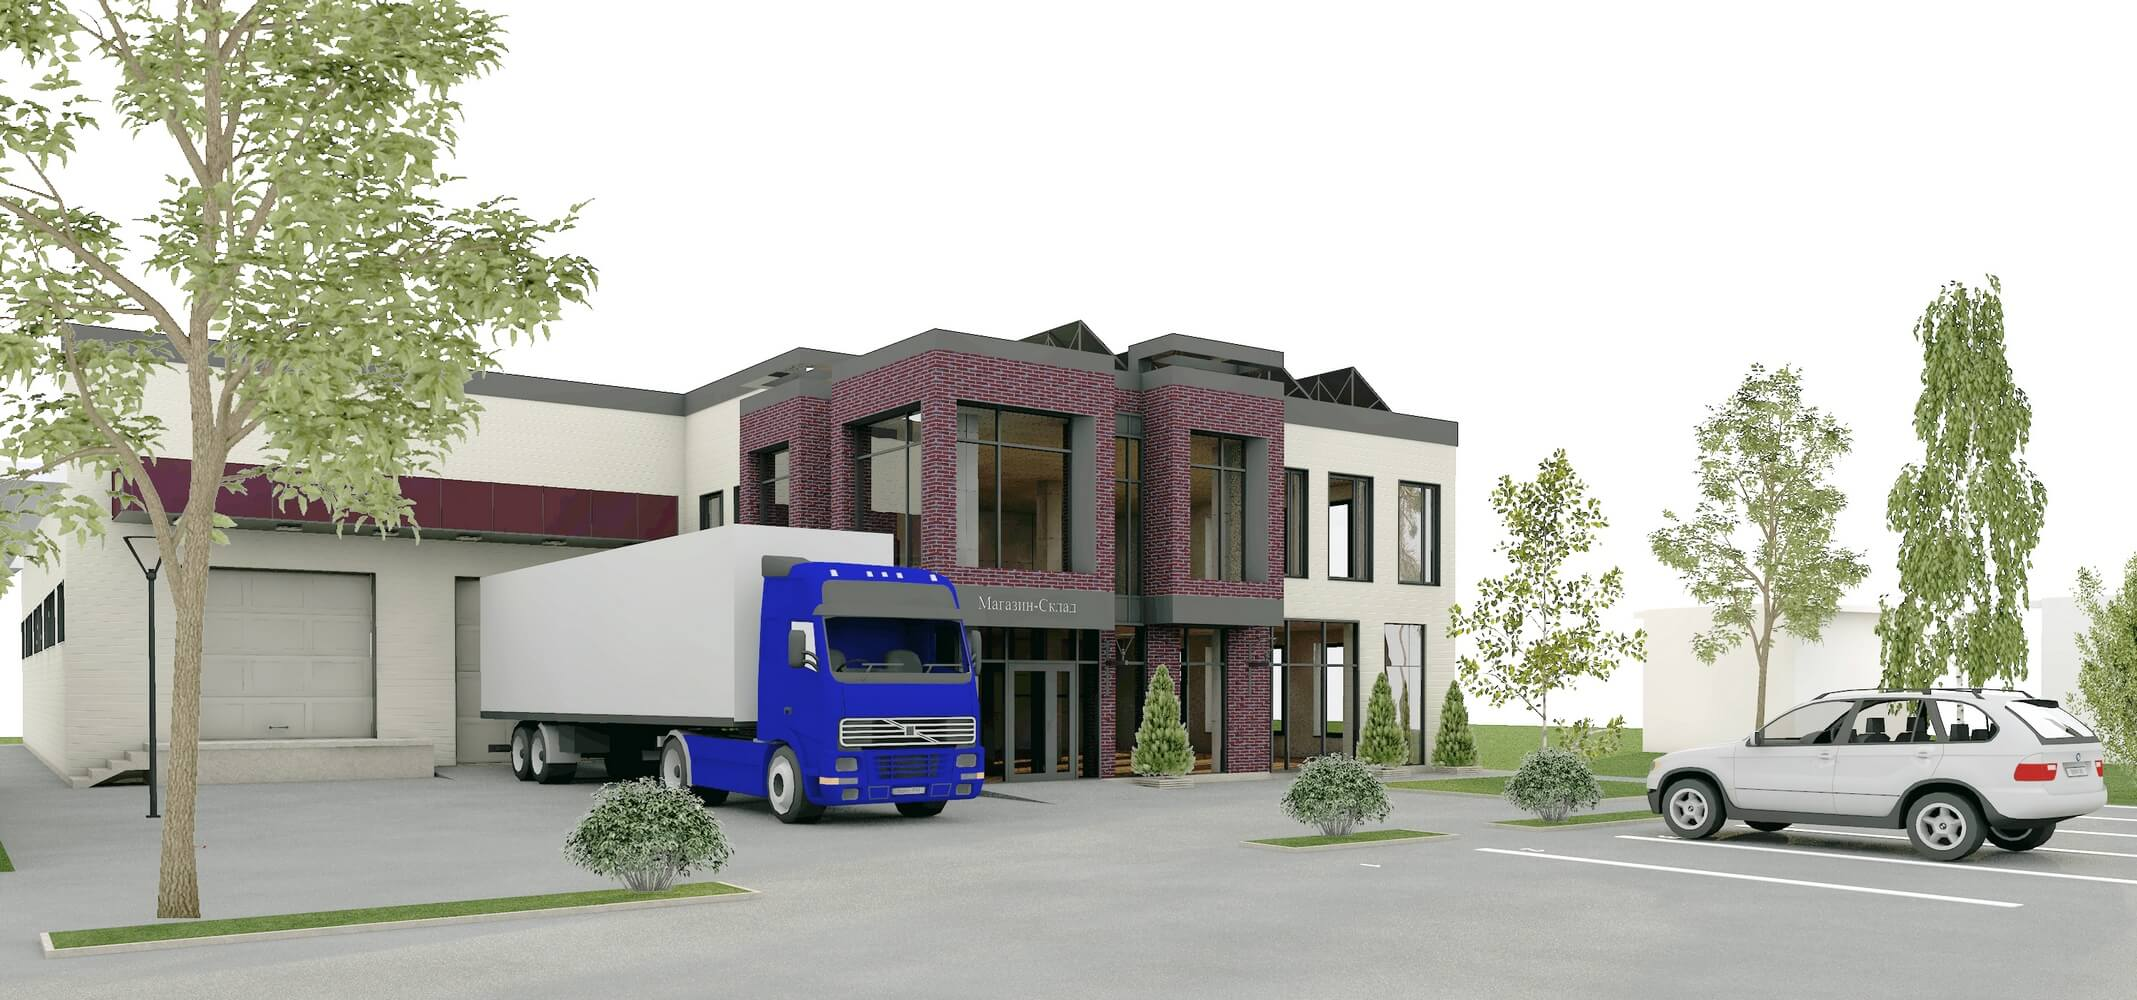 Проект магазина-склада (изображение 6)